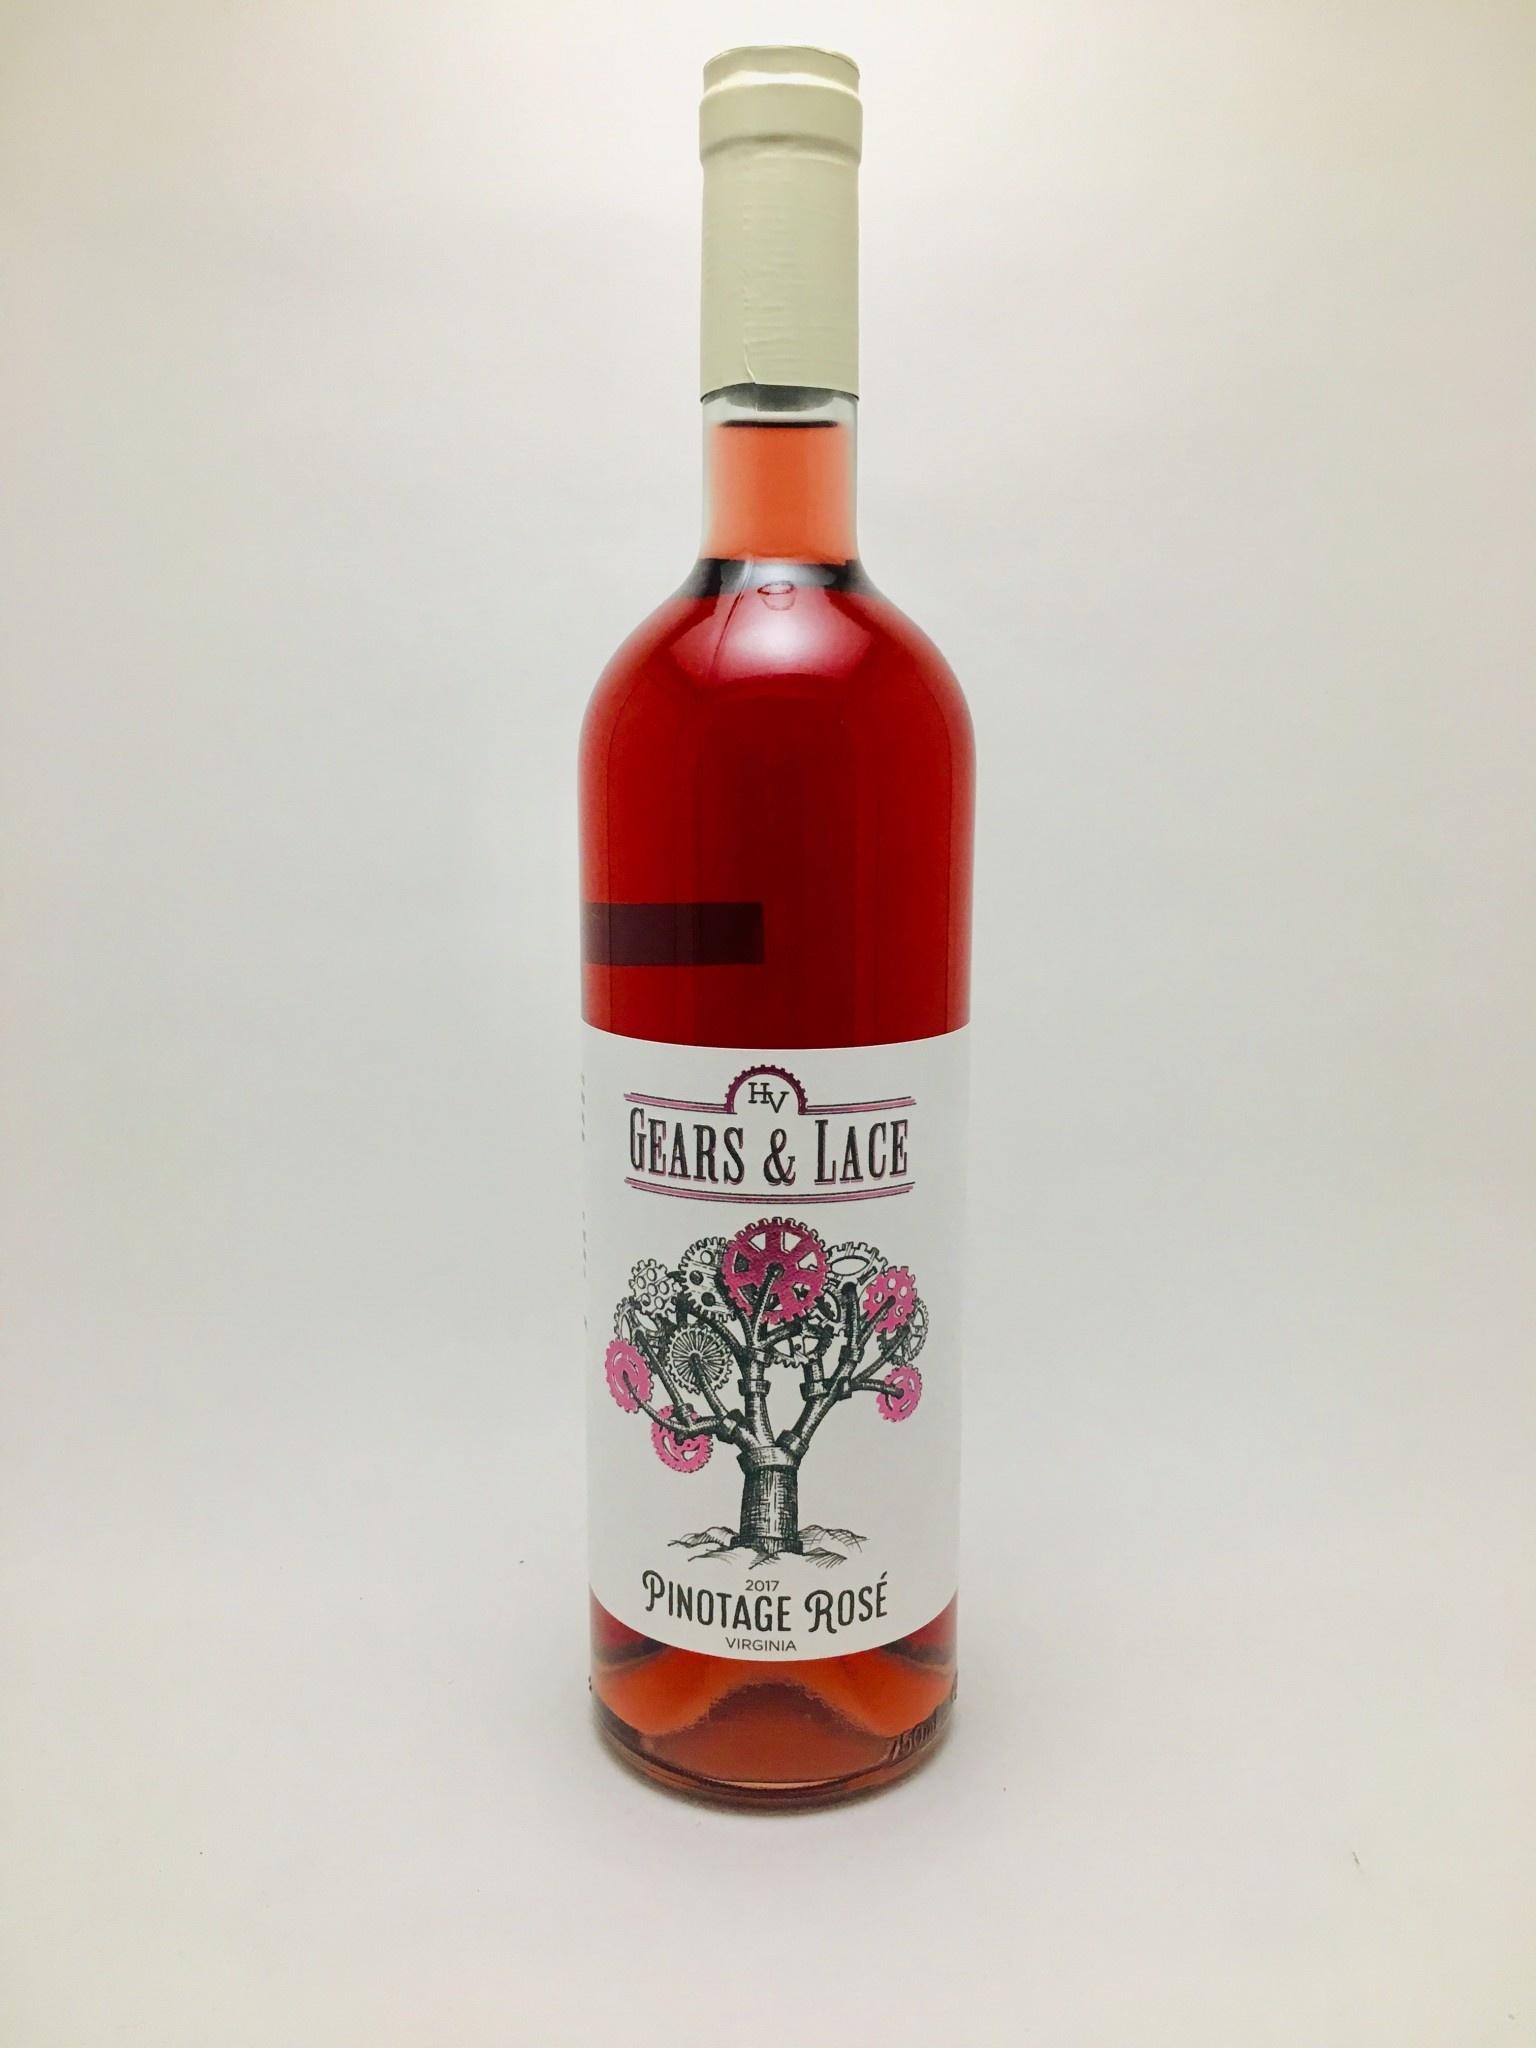 Horton Vineyard Pinotage Rosé 2017